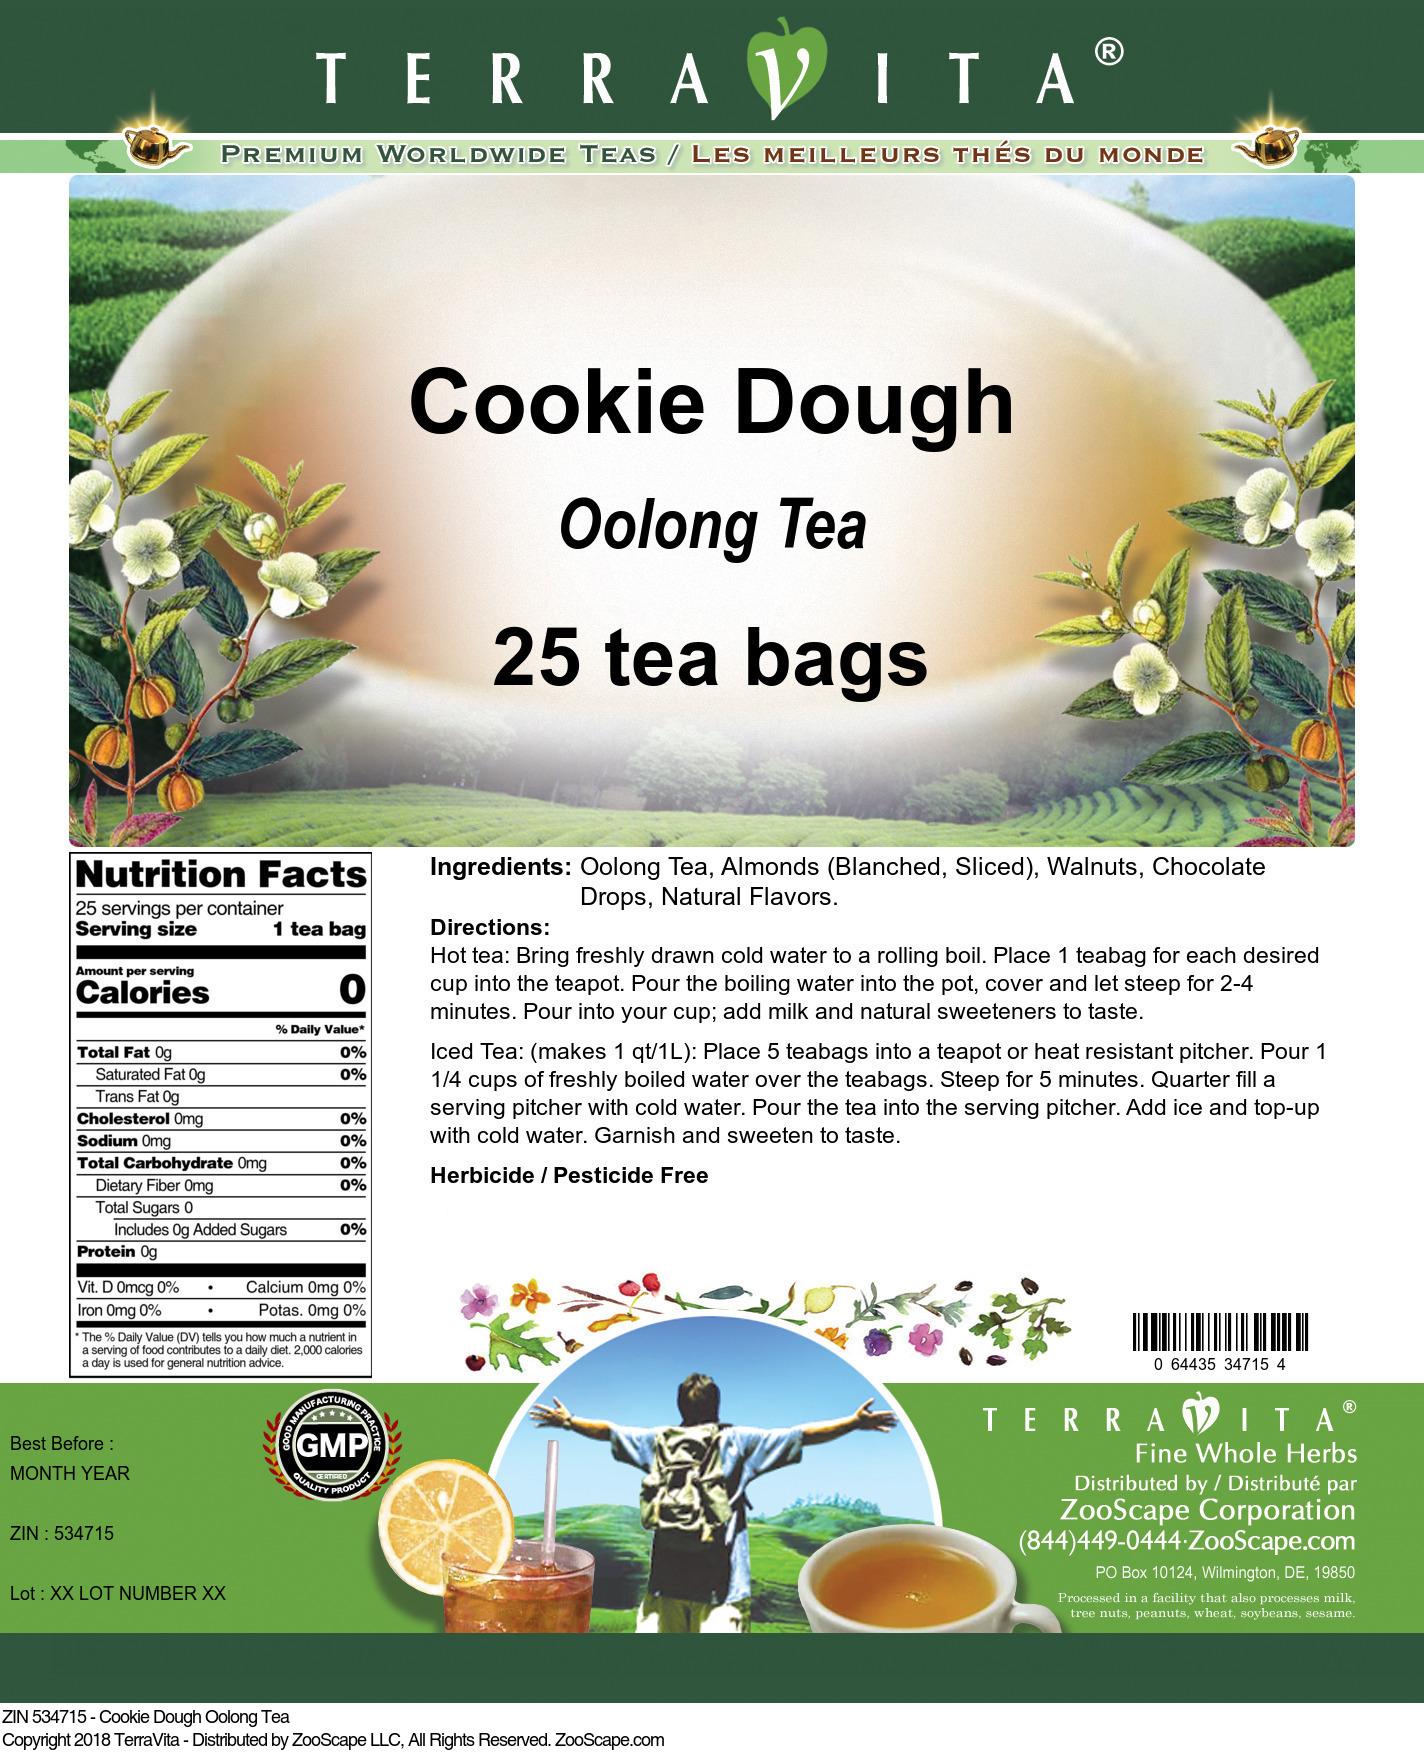 Cookie Dough Oolong Tea